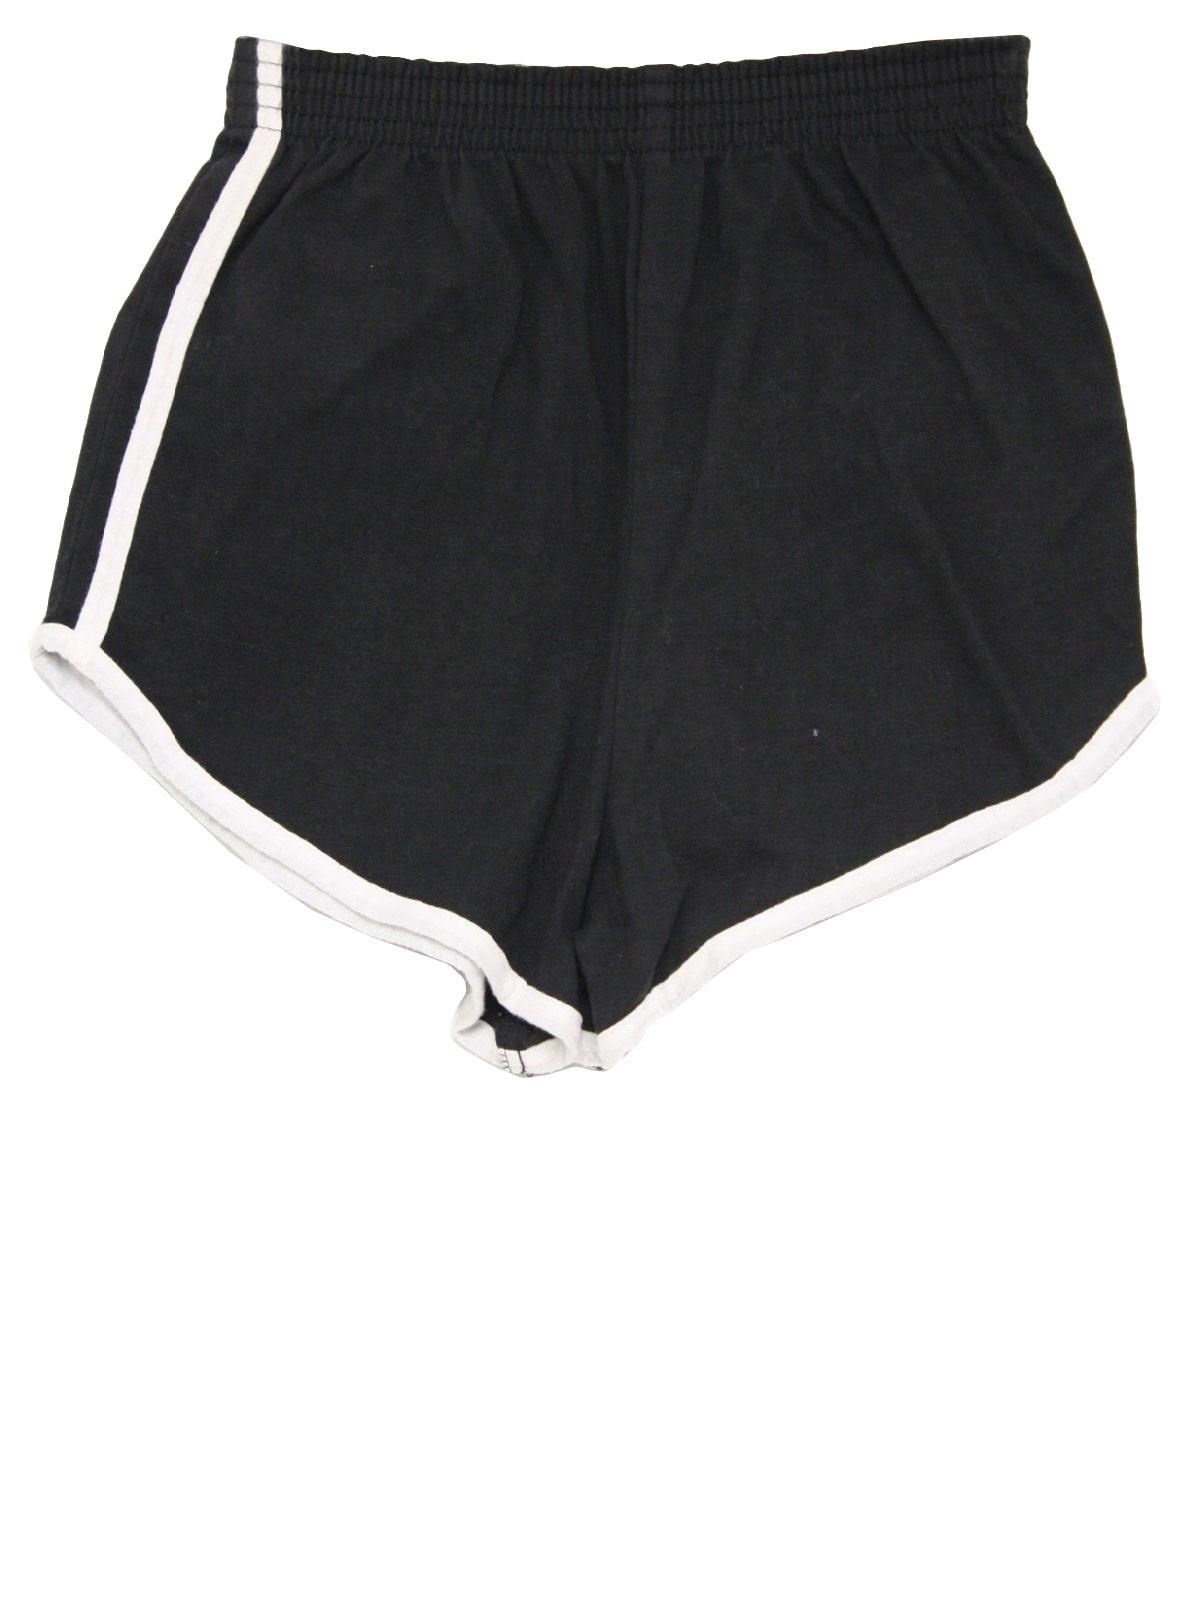 1970's Vintage Medallion Shorts: 70s -Medallion- Unisex black ...